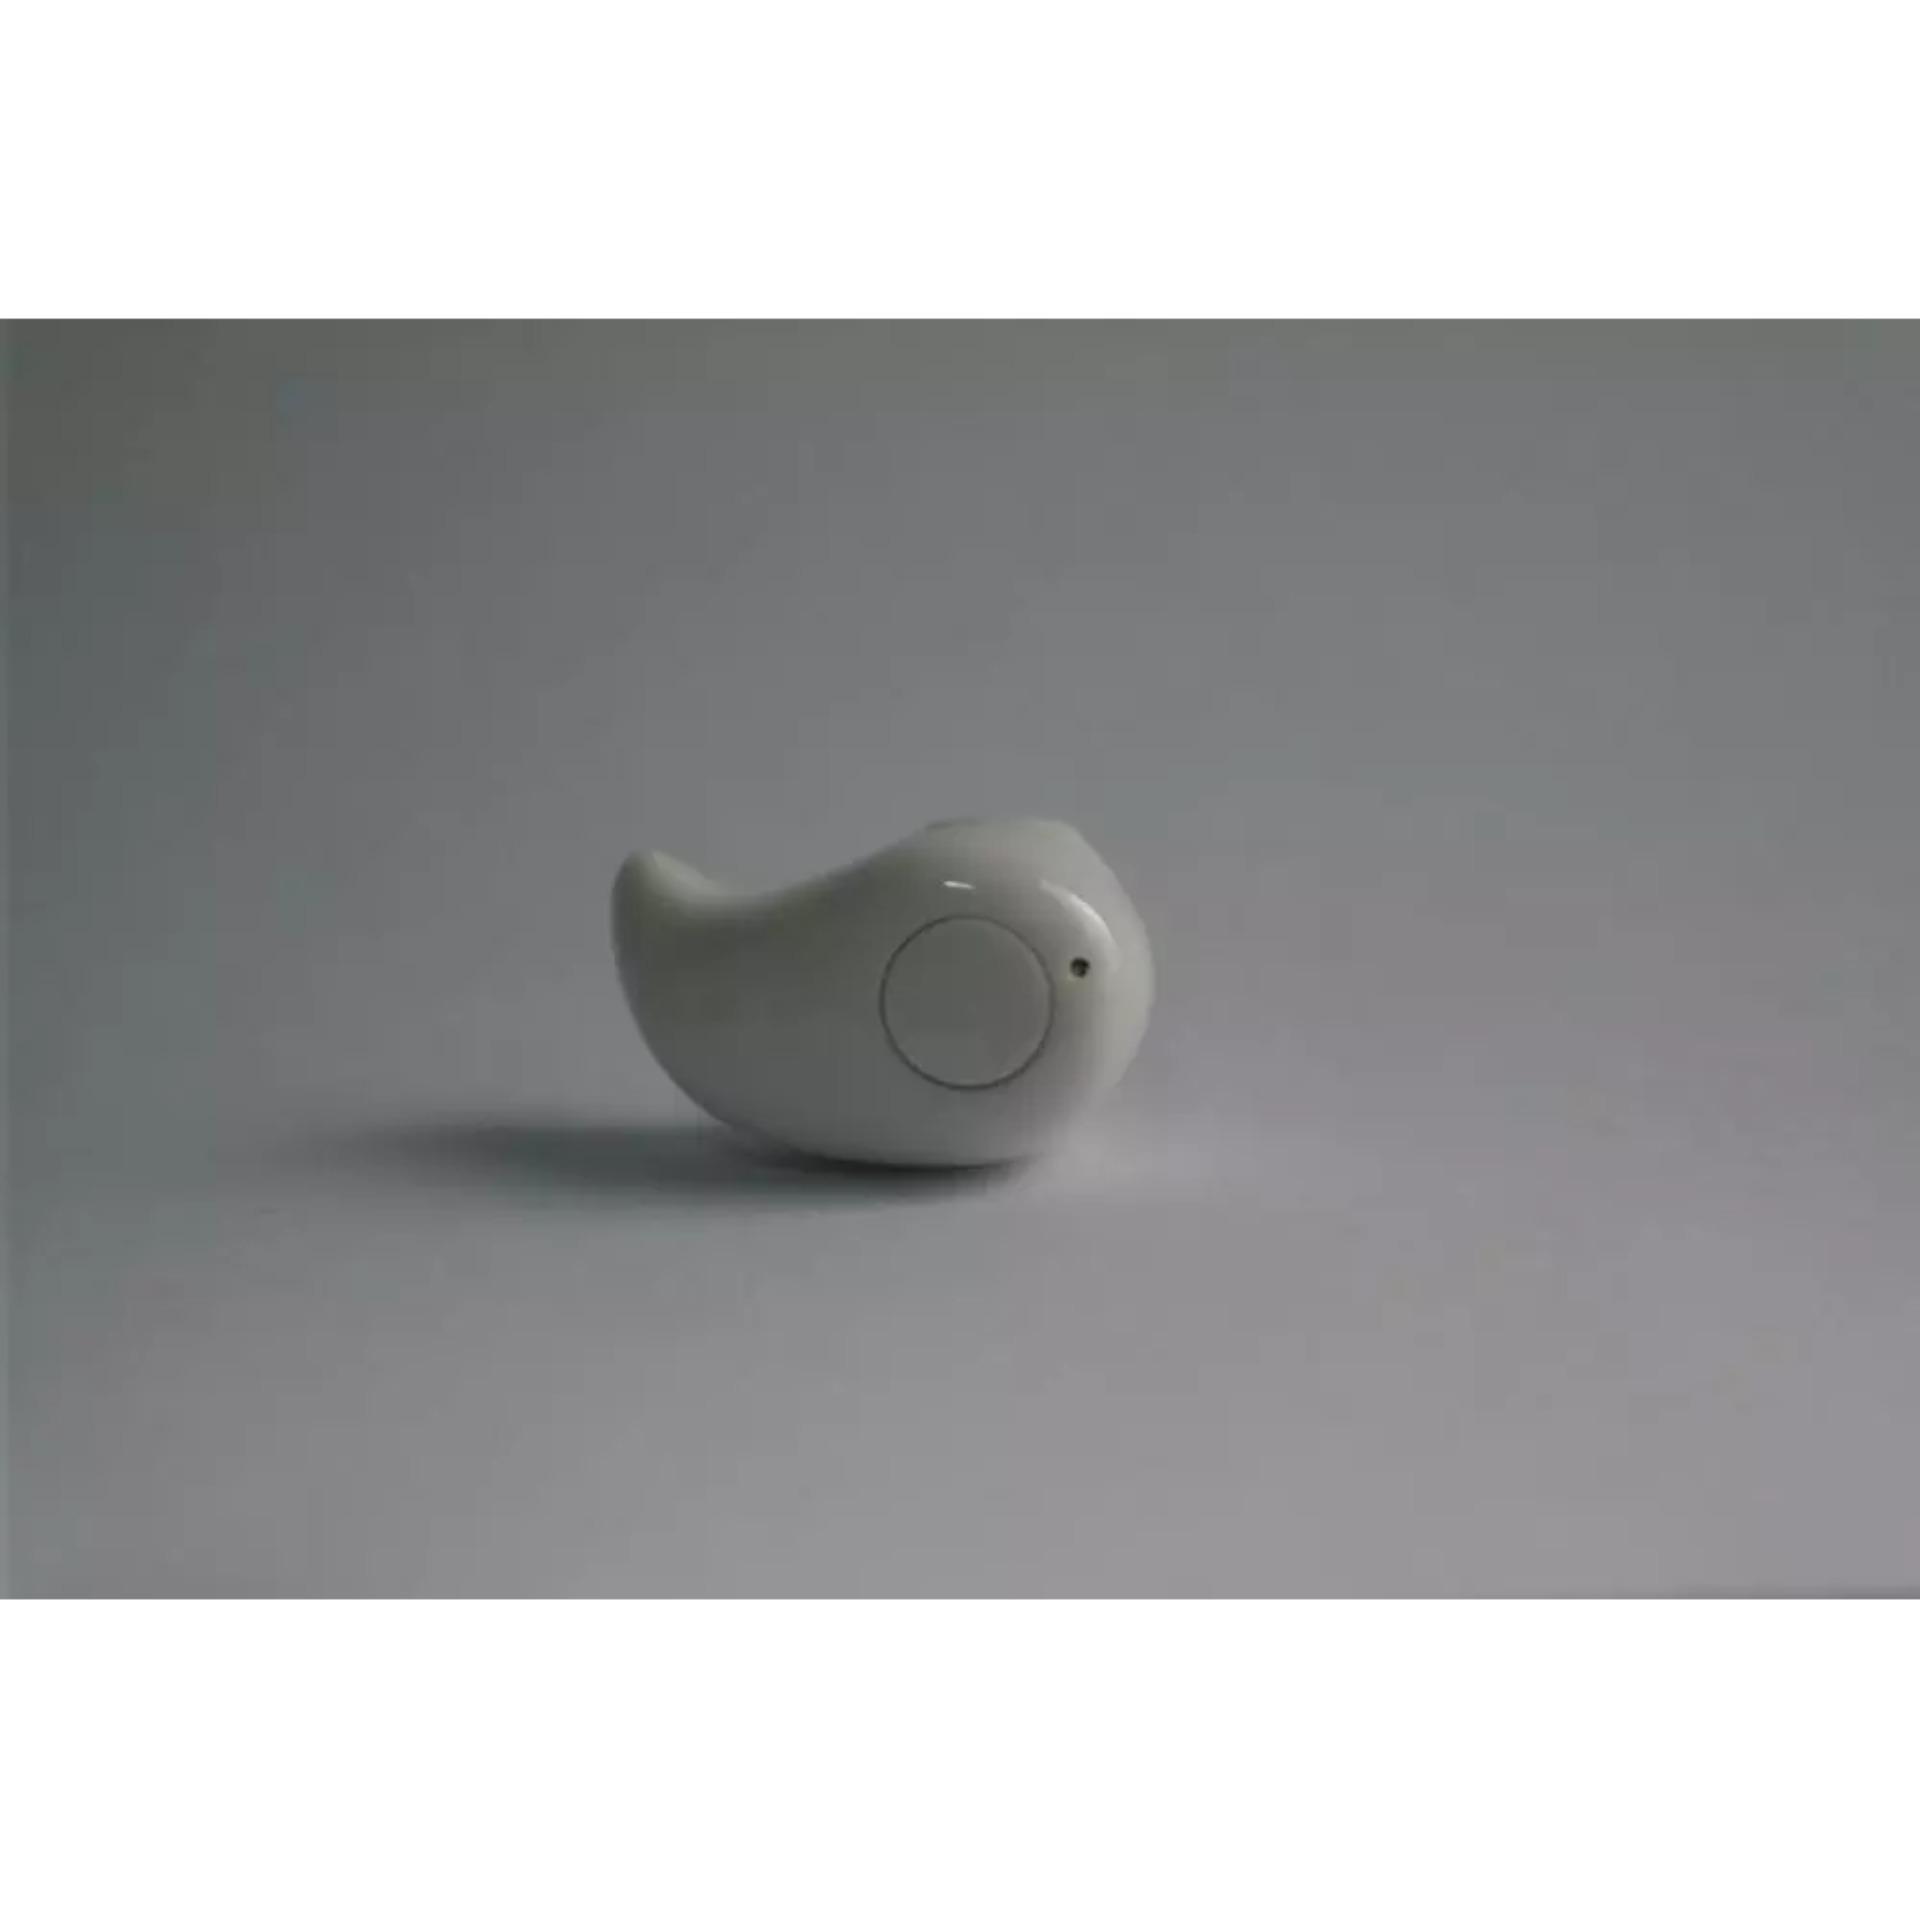 ... Headset Bluetooth Mini S530 - Micro Sport Stereo Bluetooth Earphone ...